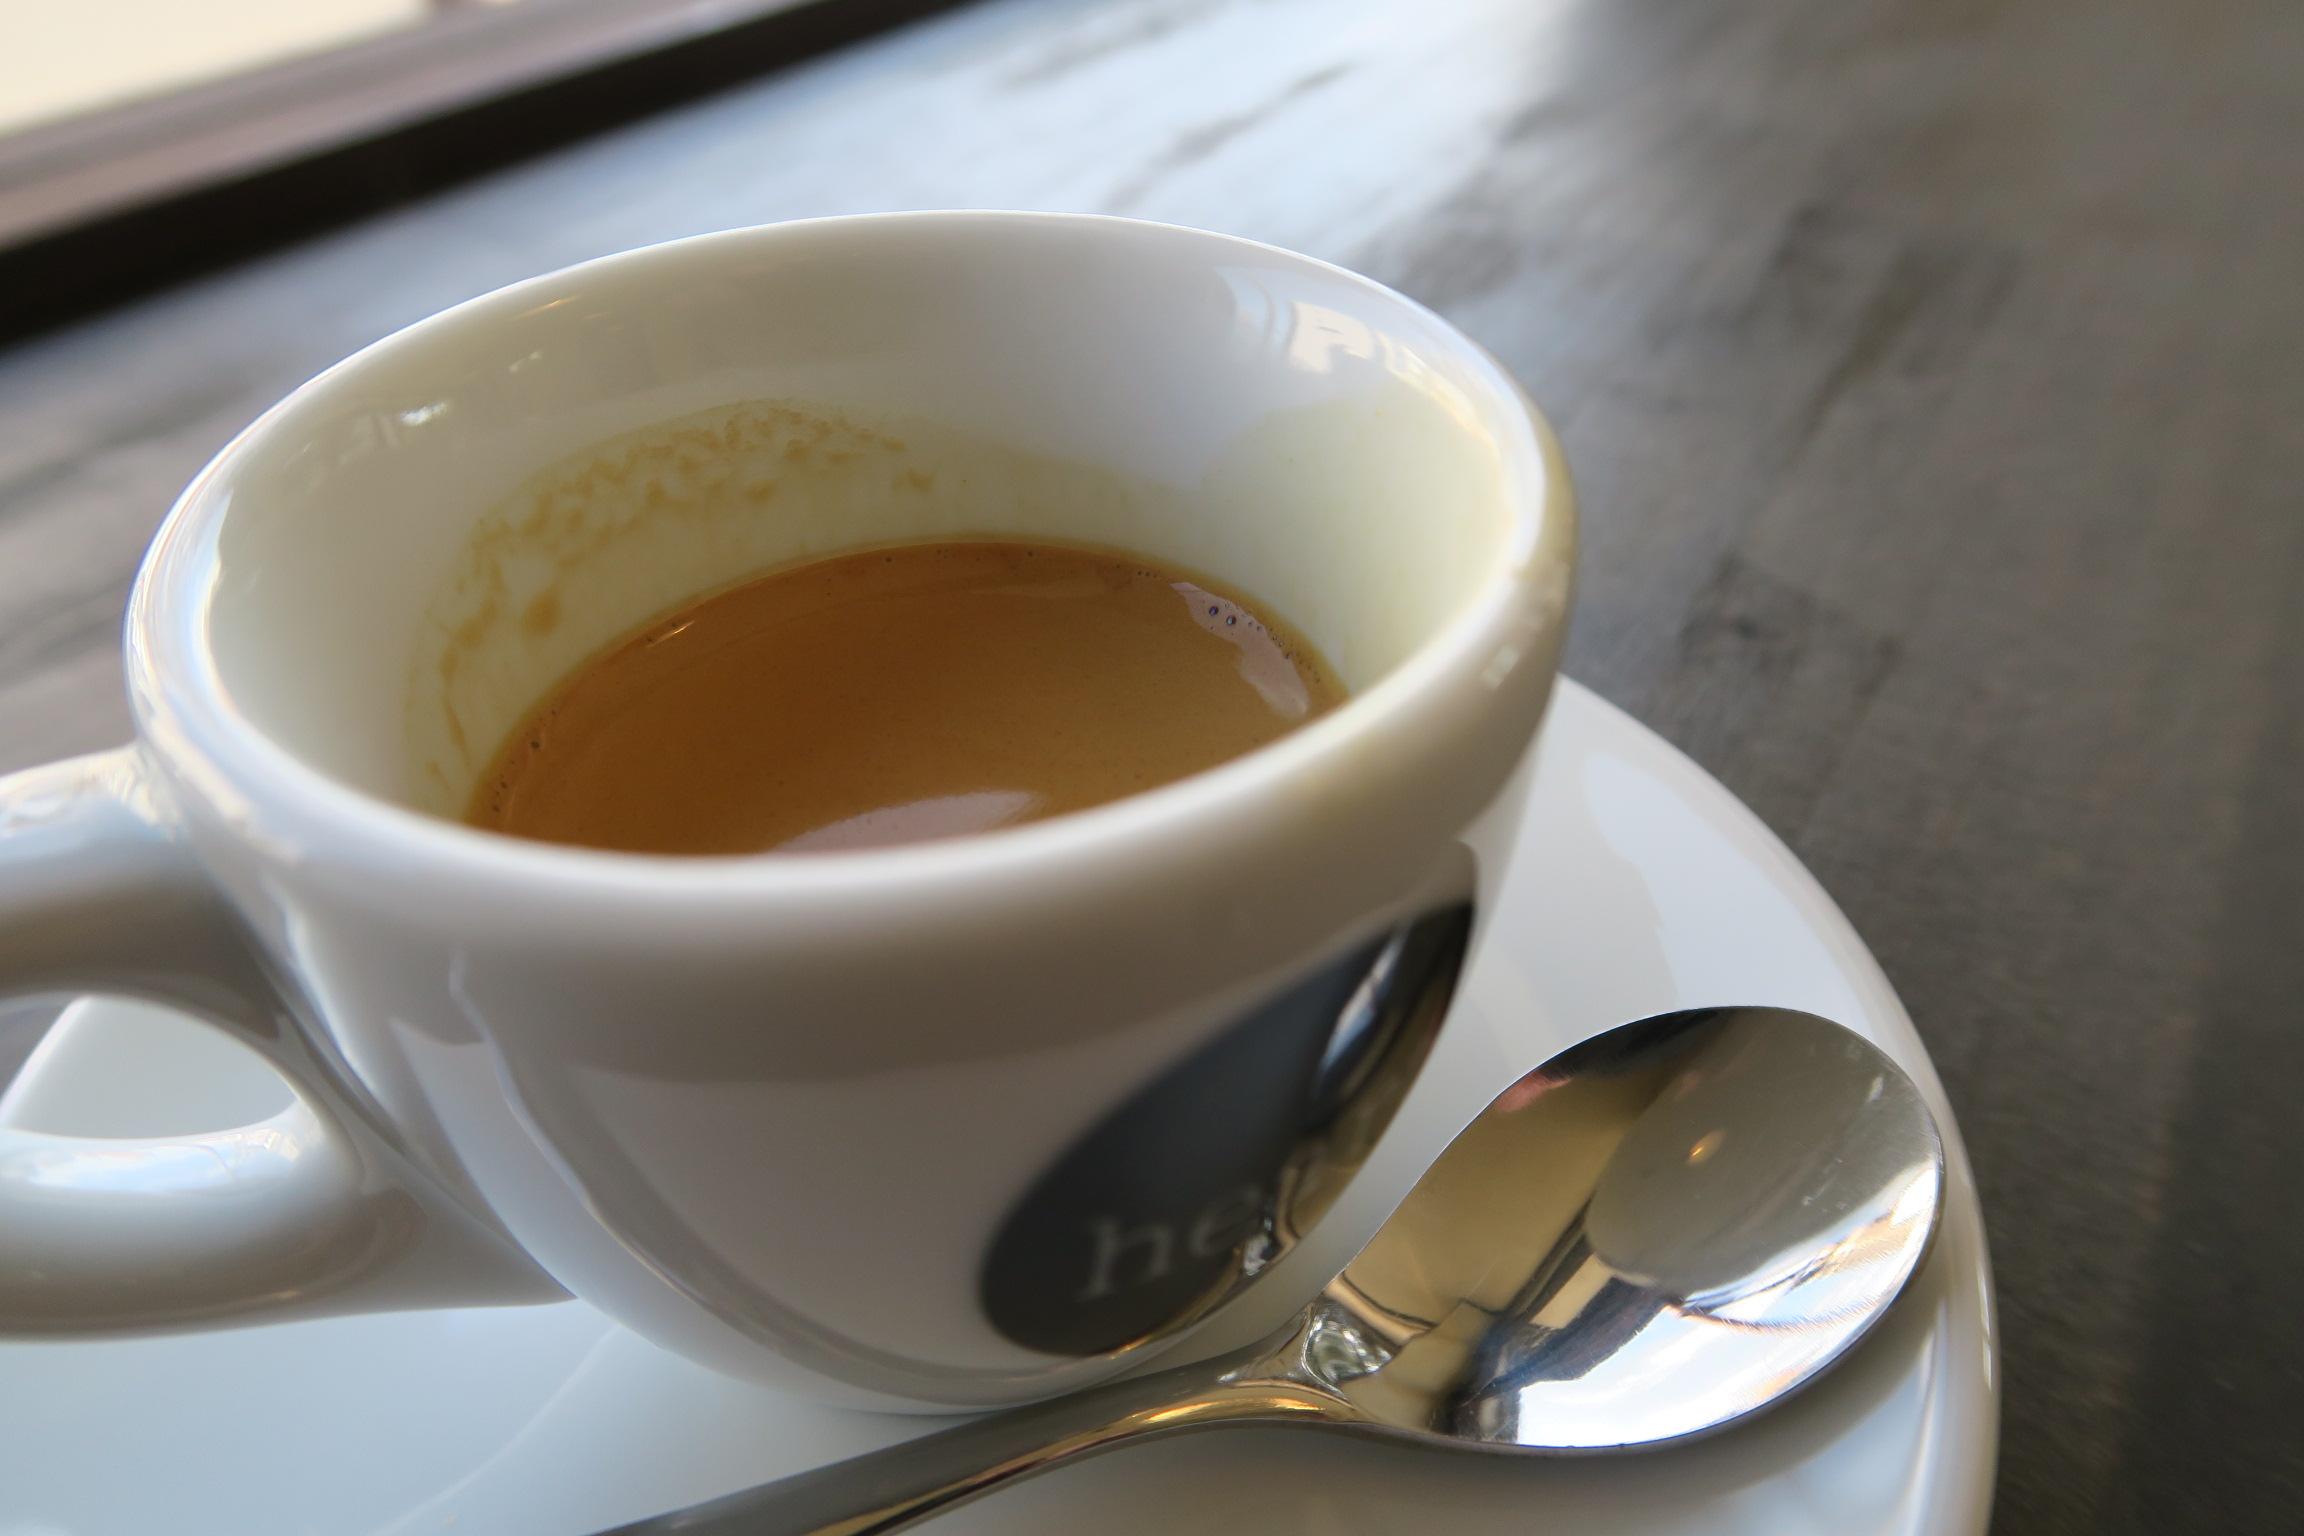 Elskaheart coffee elskaheart coffee voltagebd Images